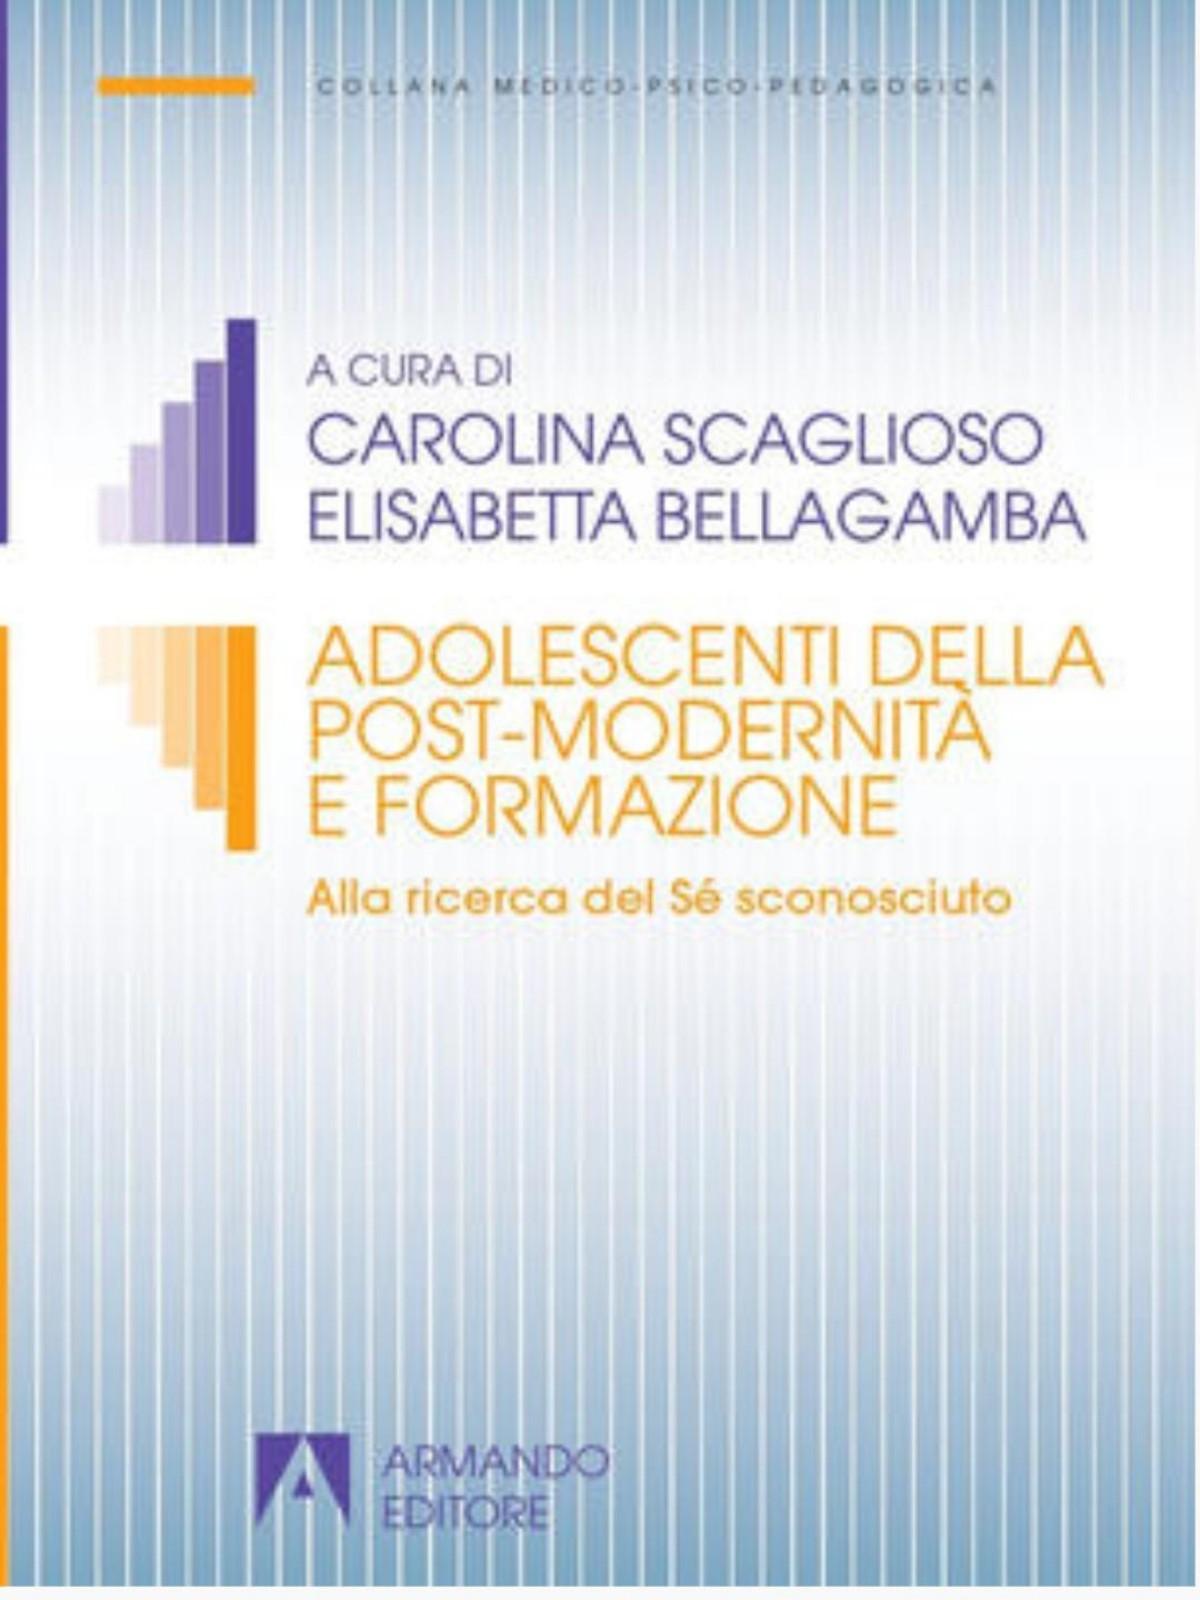 libro-bellagamba-1200.jpg